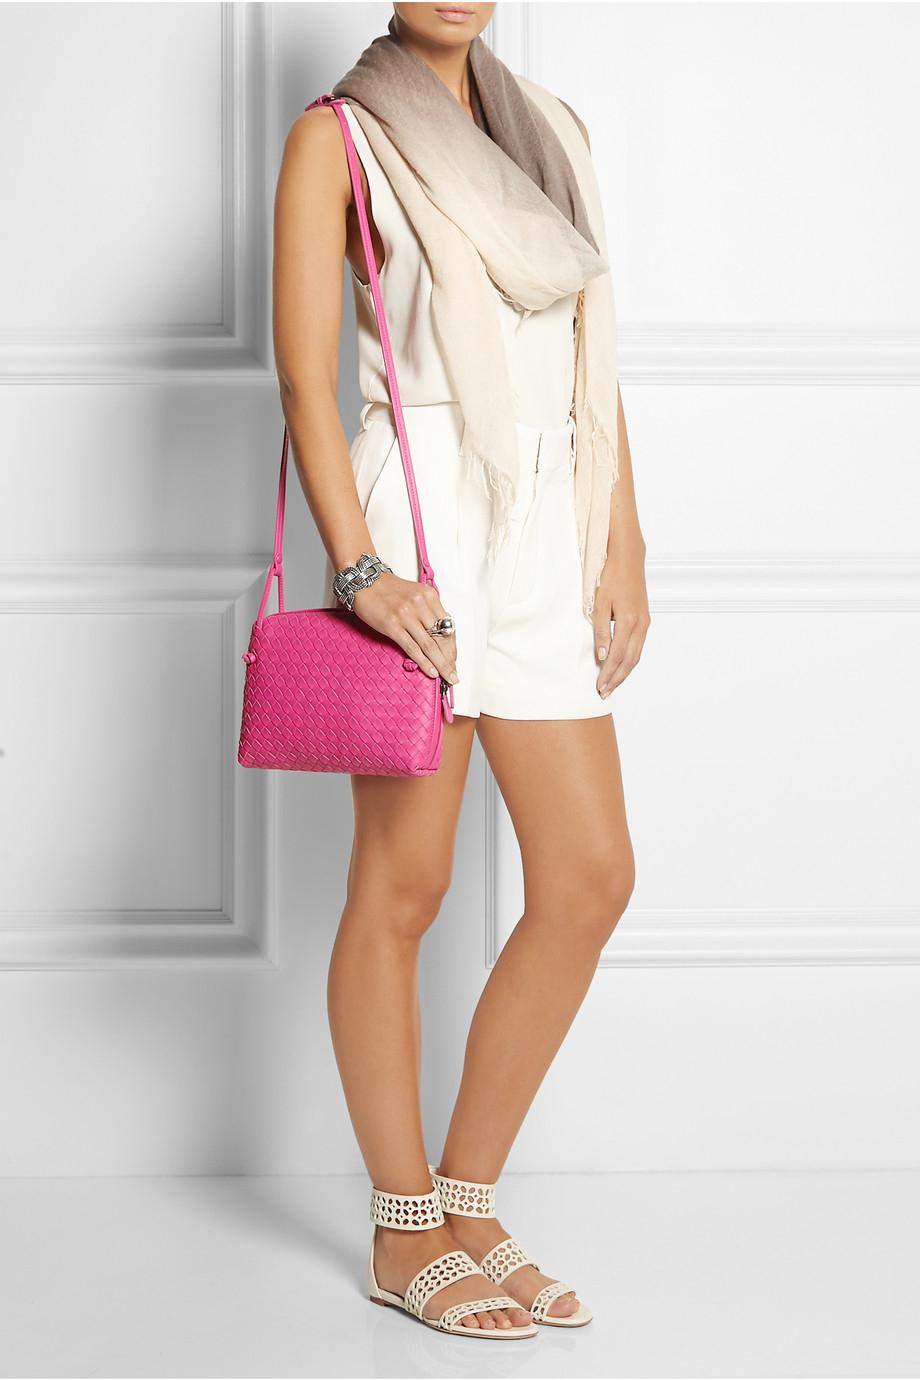 58f583394fa4 Bottega Veneta Messenger Intrecciato Leather Shoulder Bag in Pink - Lyst